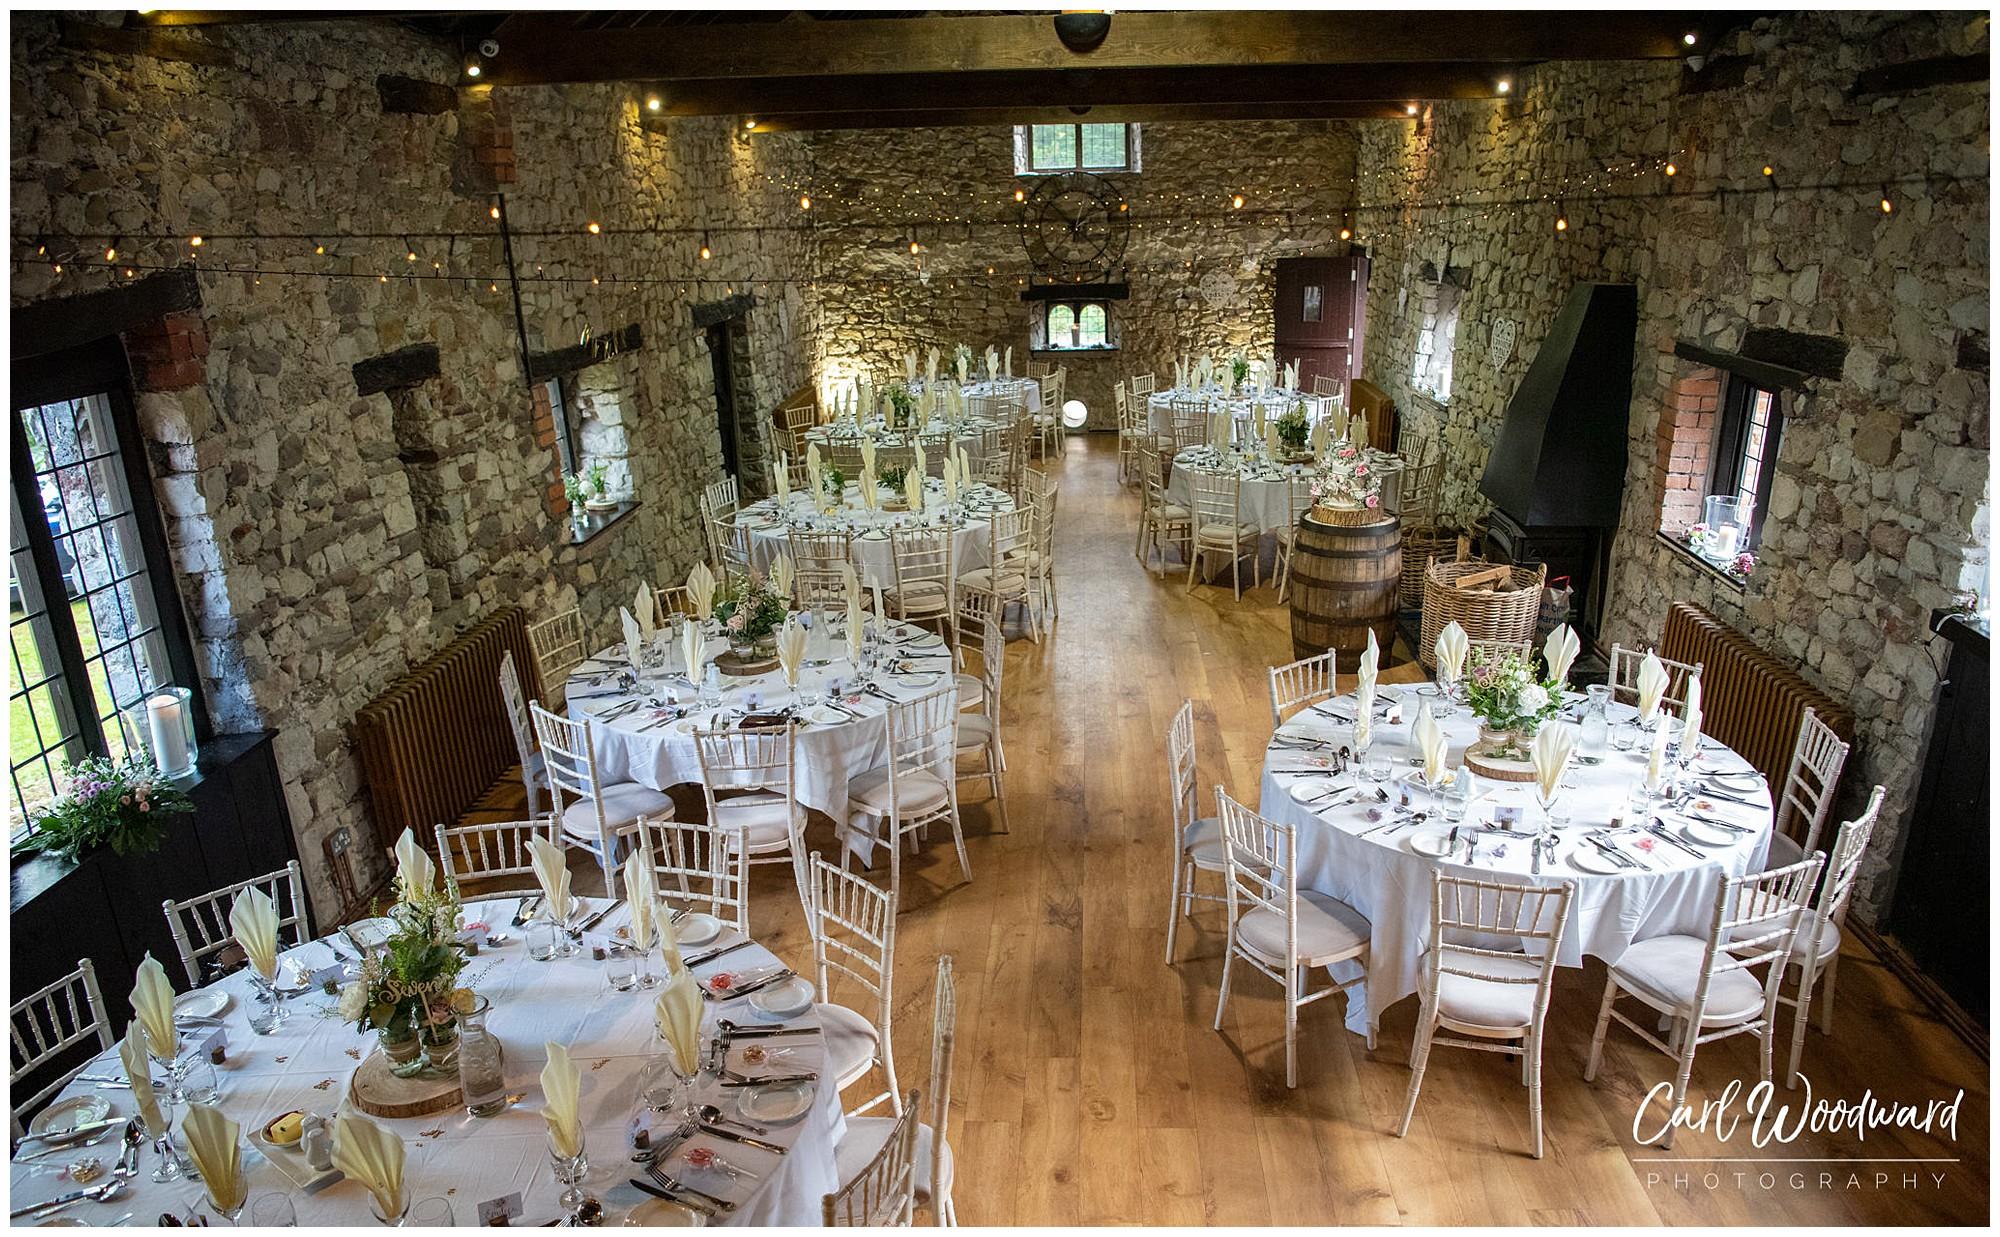 002-Pencoed-House-Estate-Wedding-Photographer.jpg